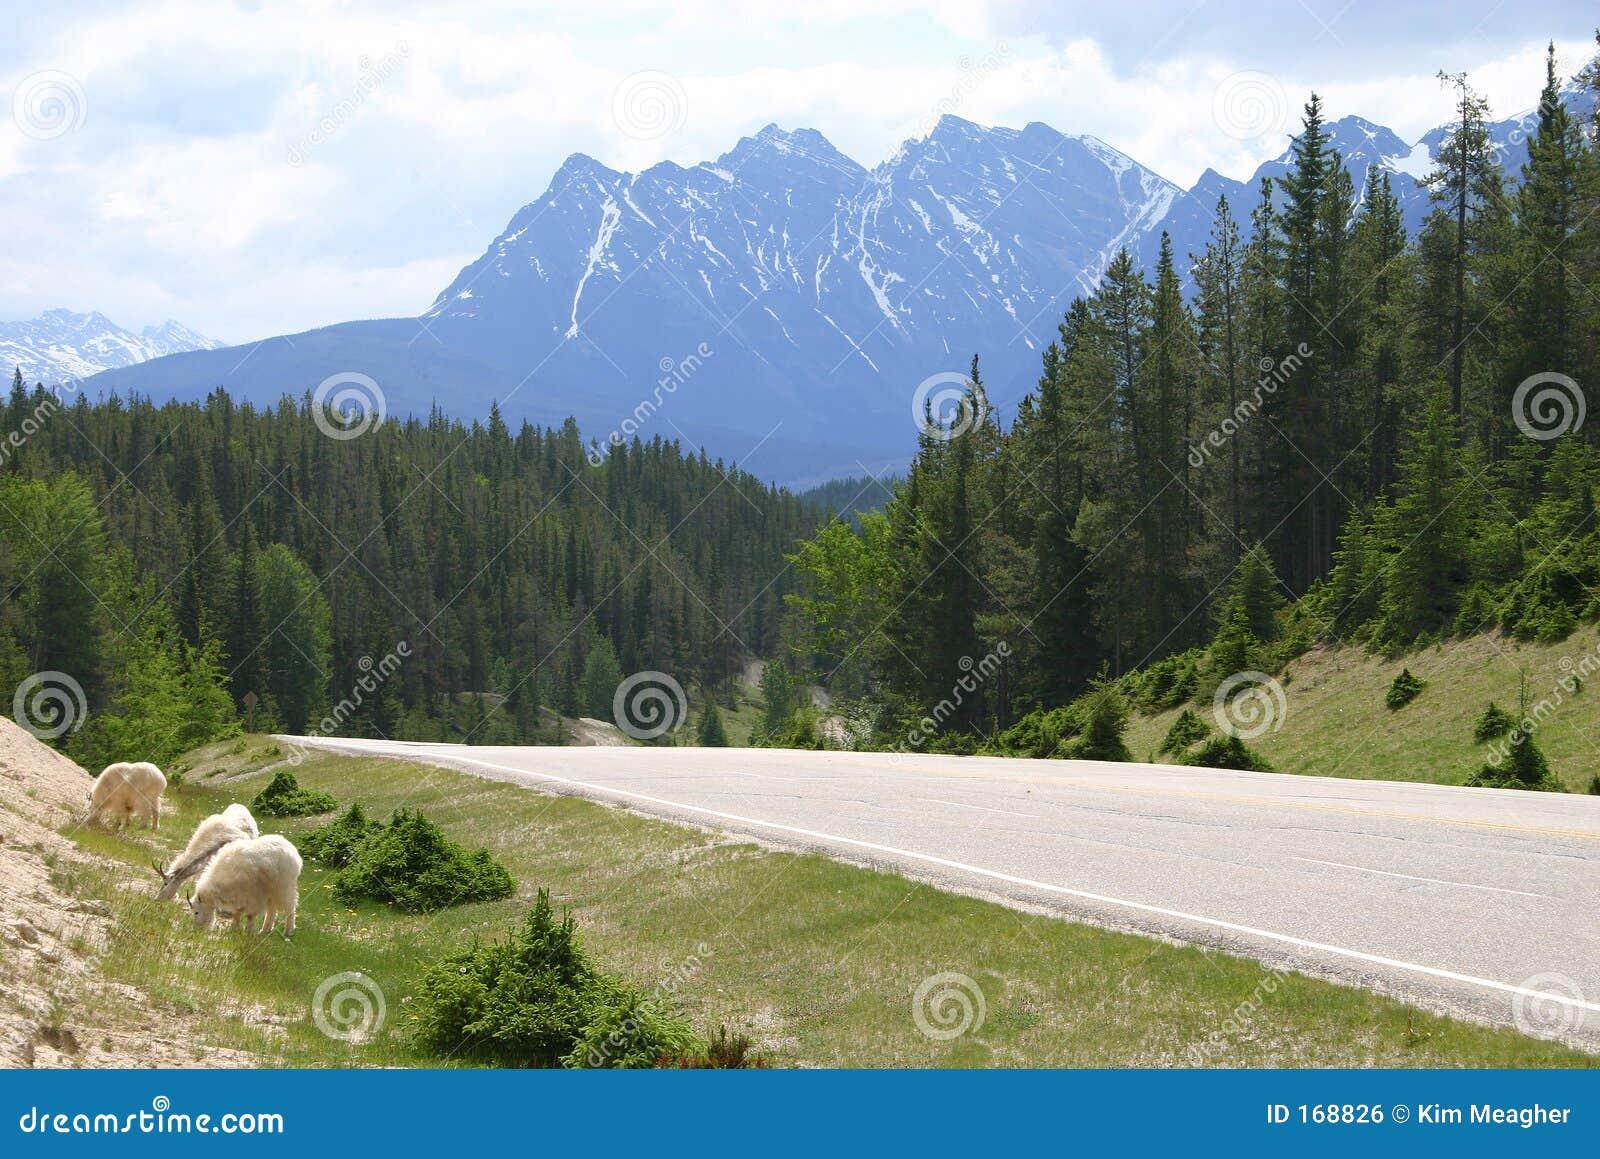 Download Canadian Rockies II stock photo. Image of mountainous, travel - 168826